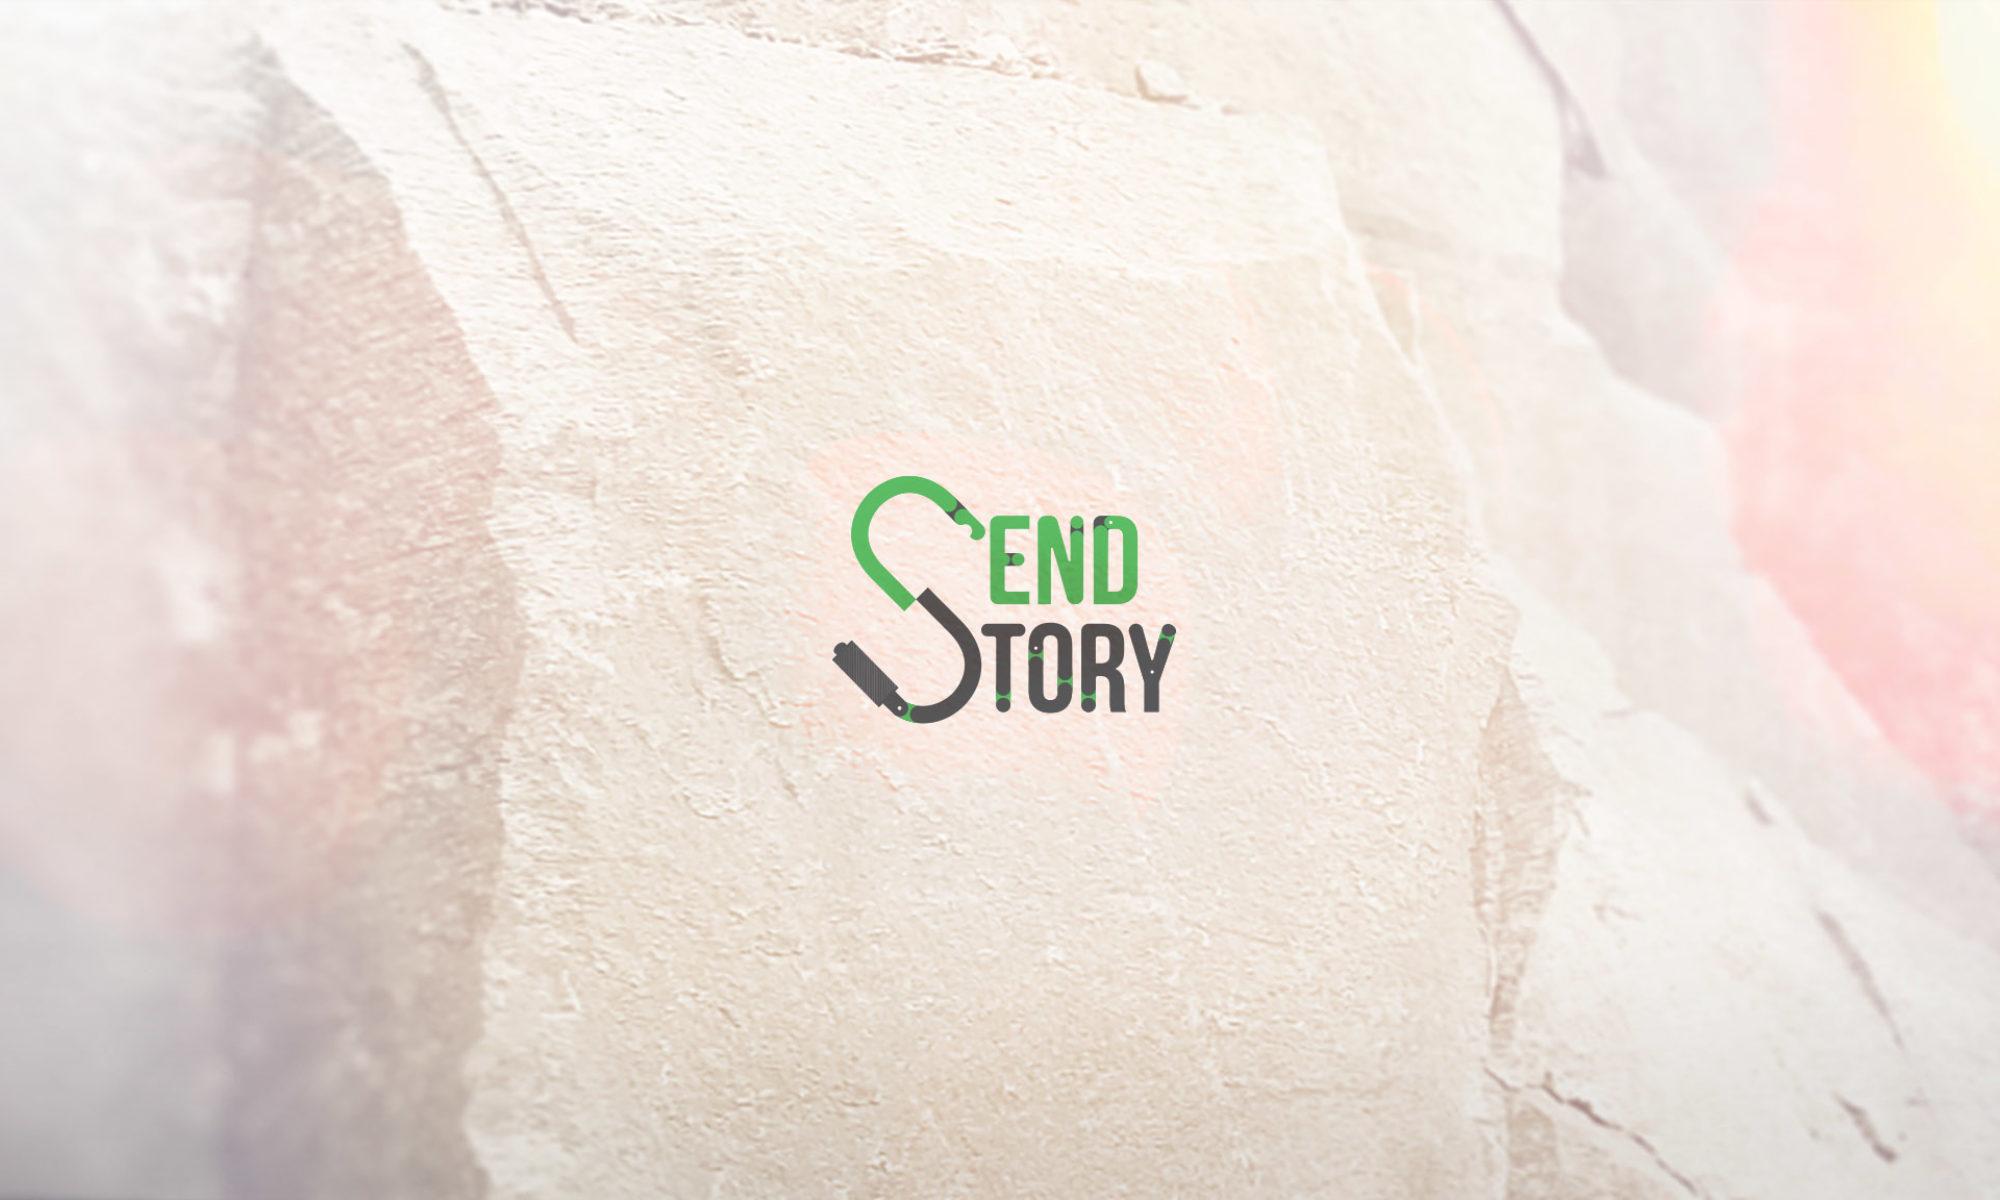 Send Story